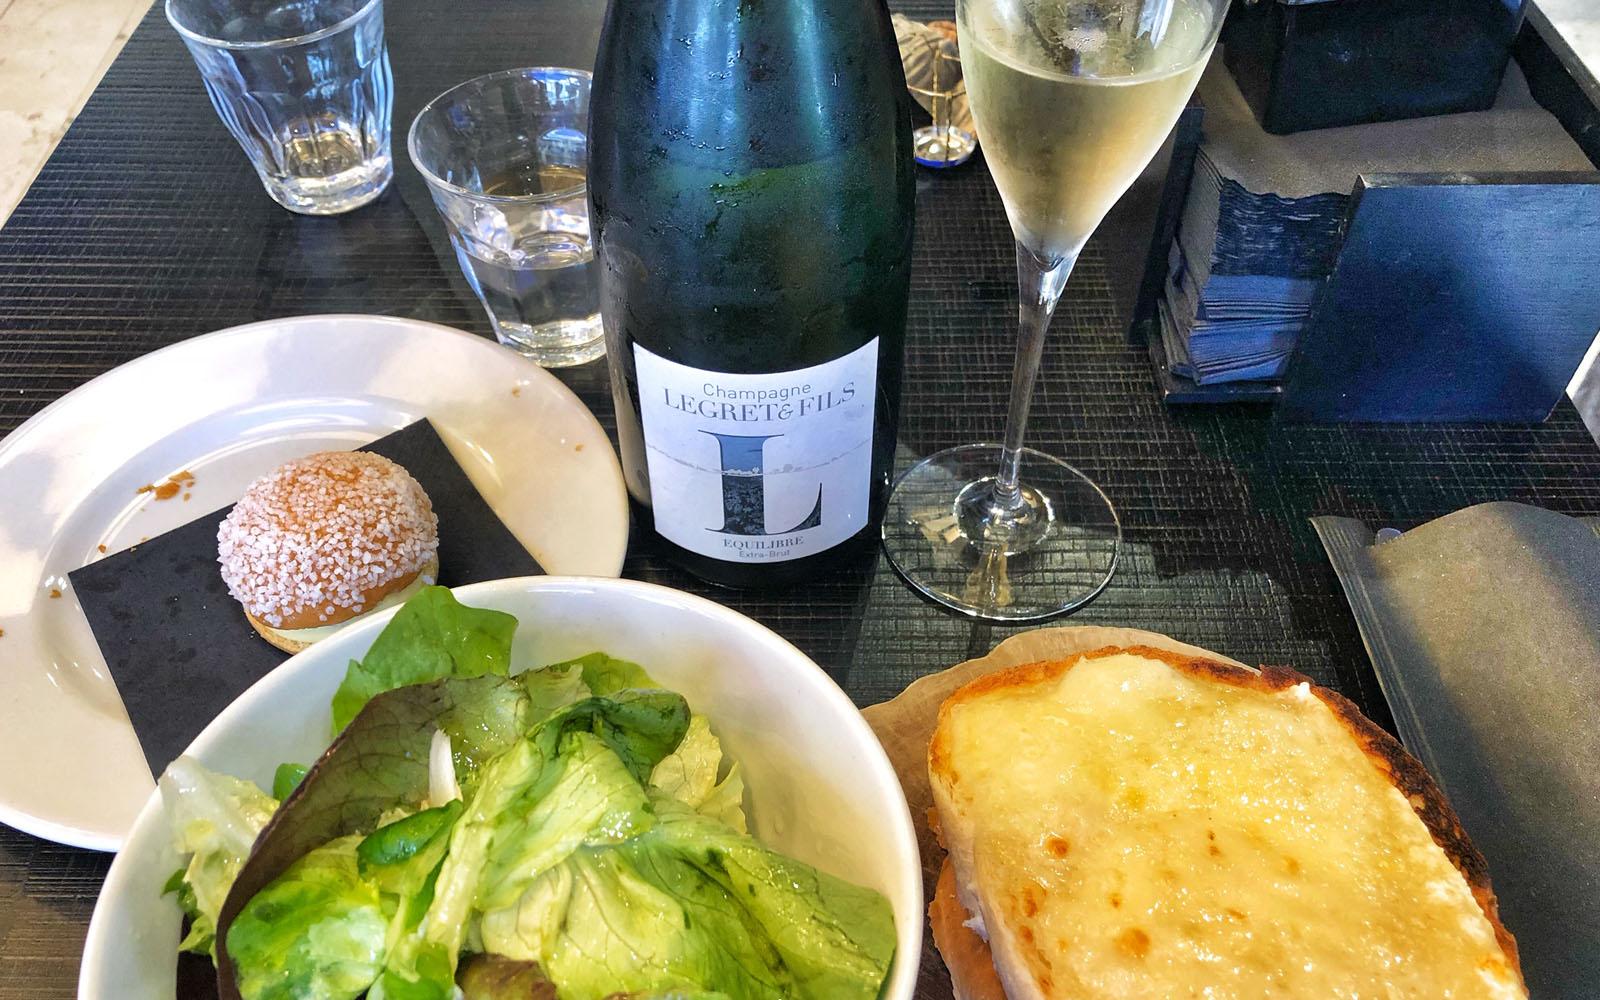 Il mio spuntino: croque monsieur veggie, mini tropézienne e champagne.